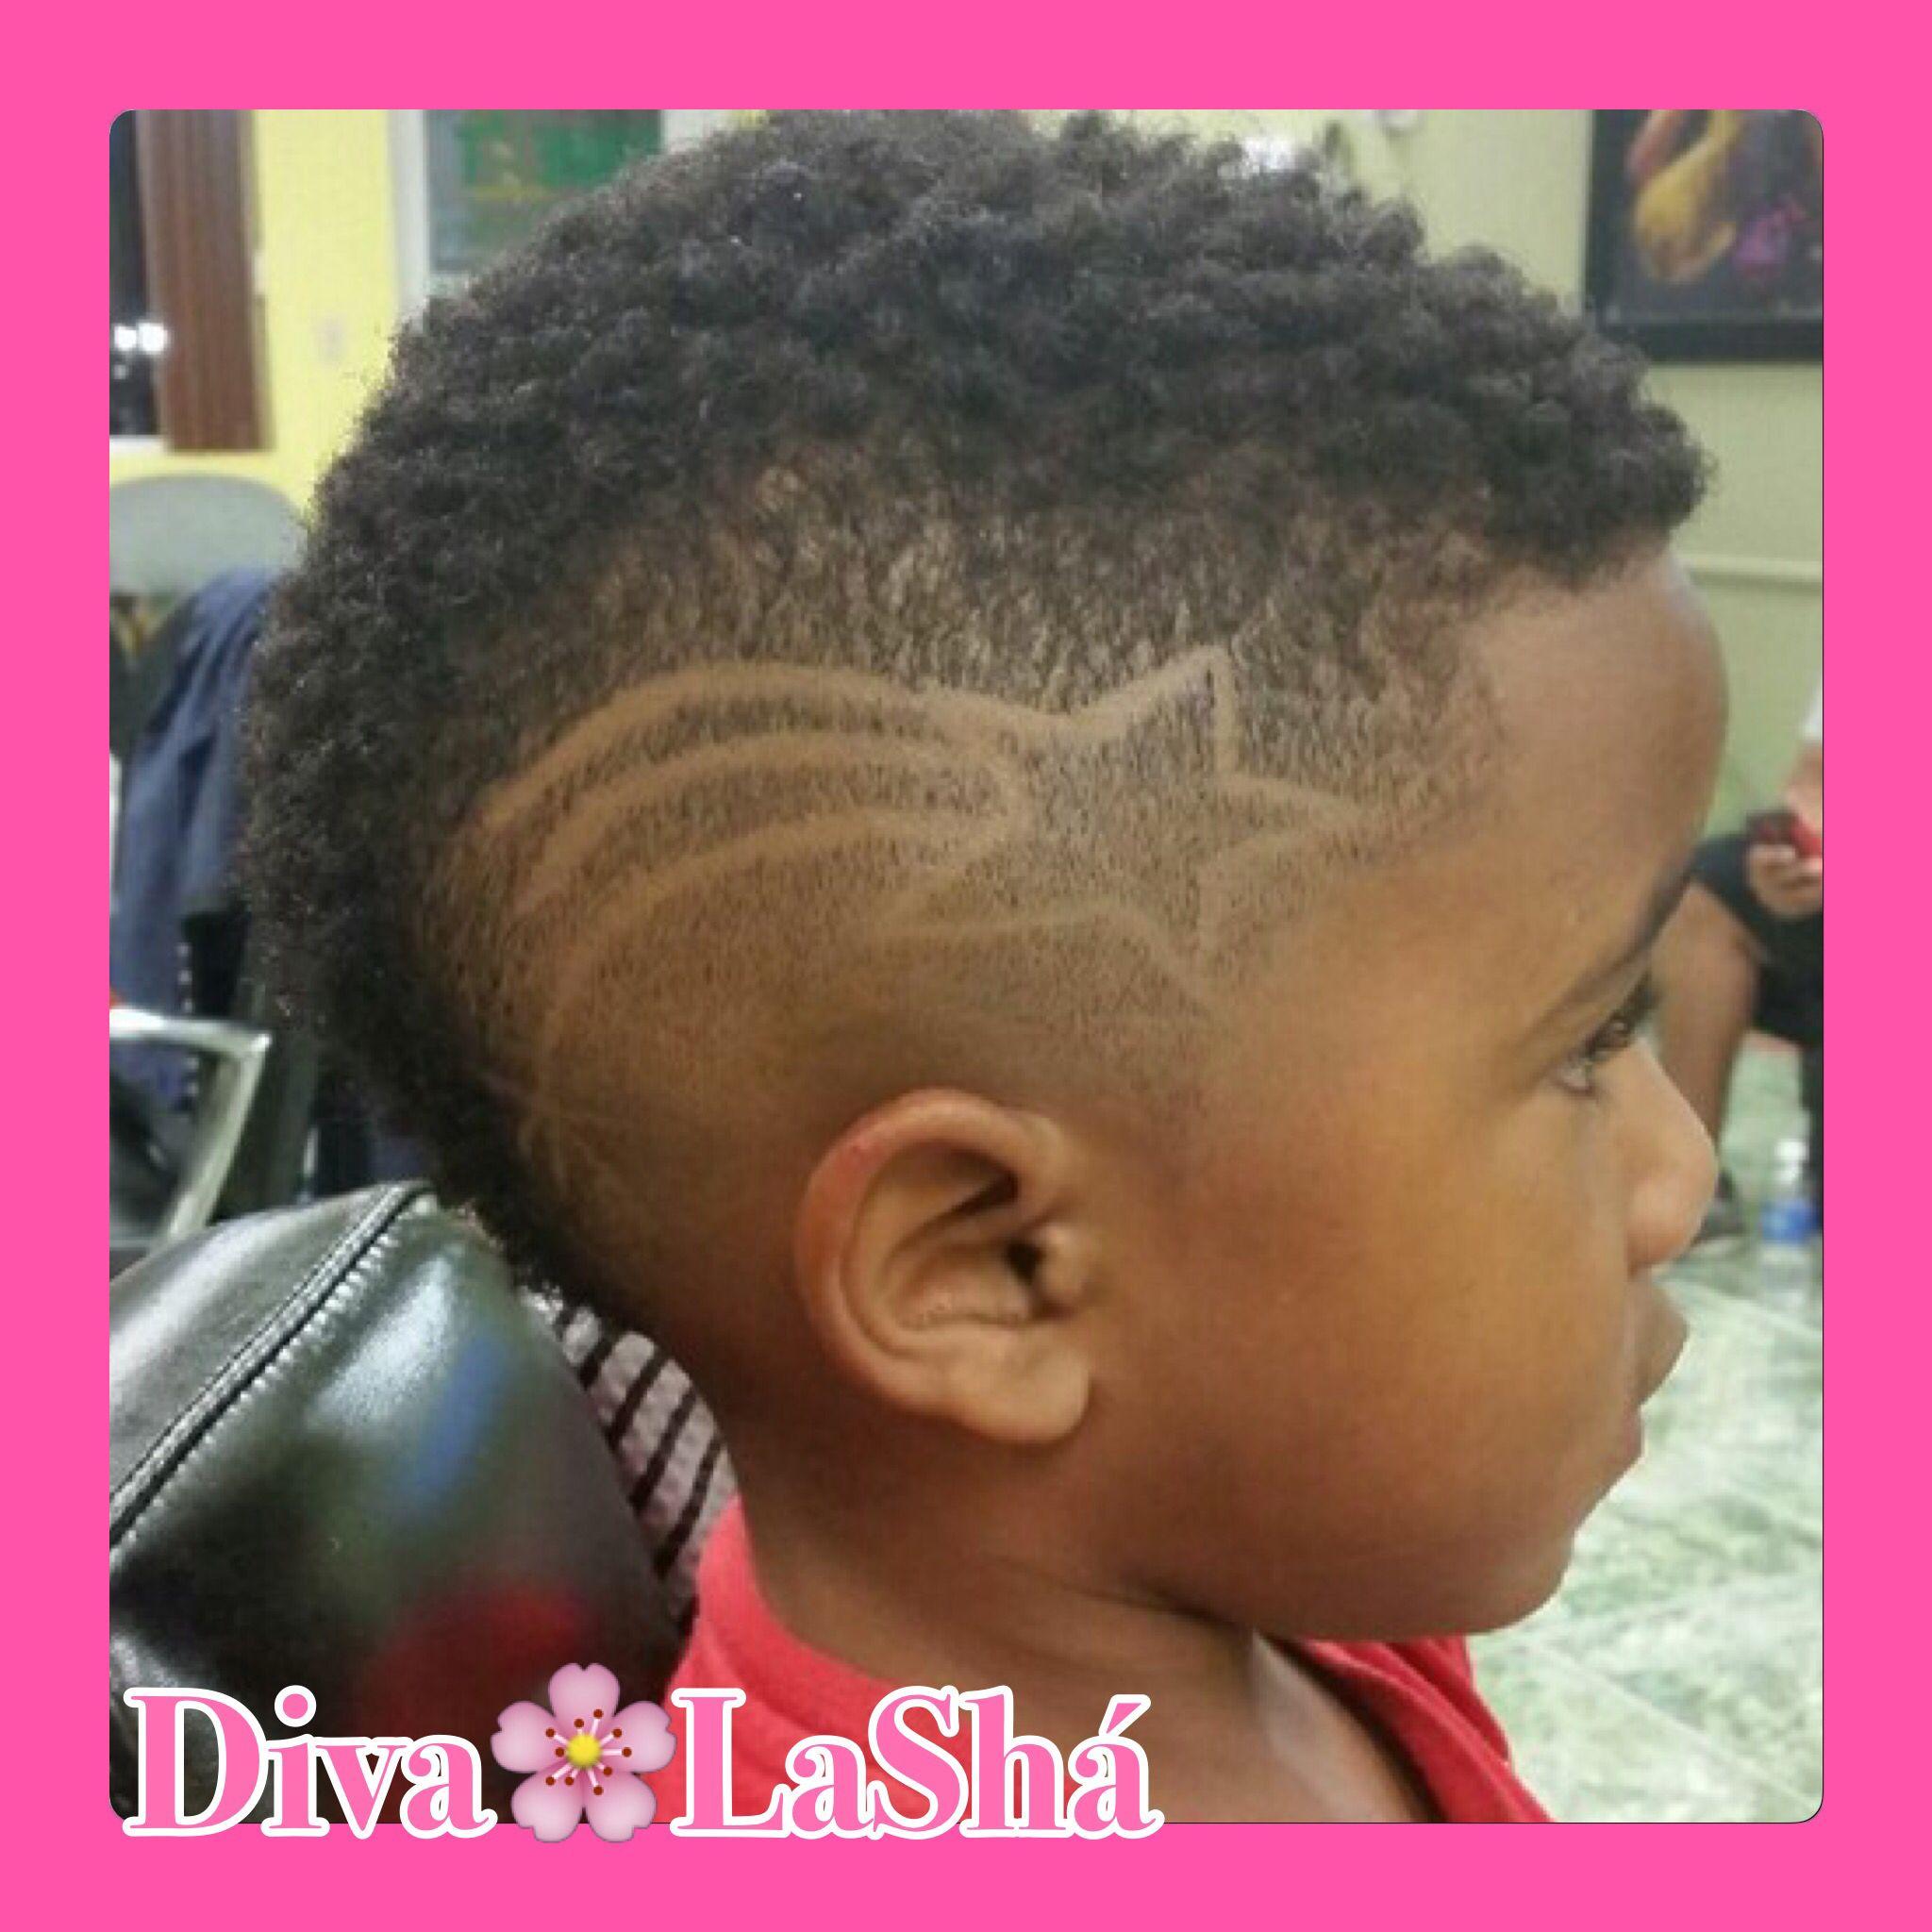 Lightning Bolt Haircut Design Boys